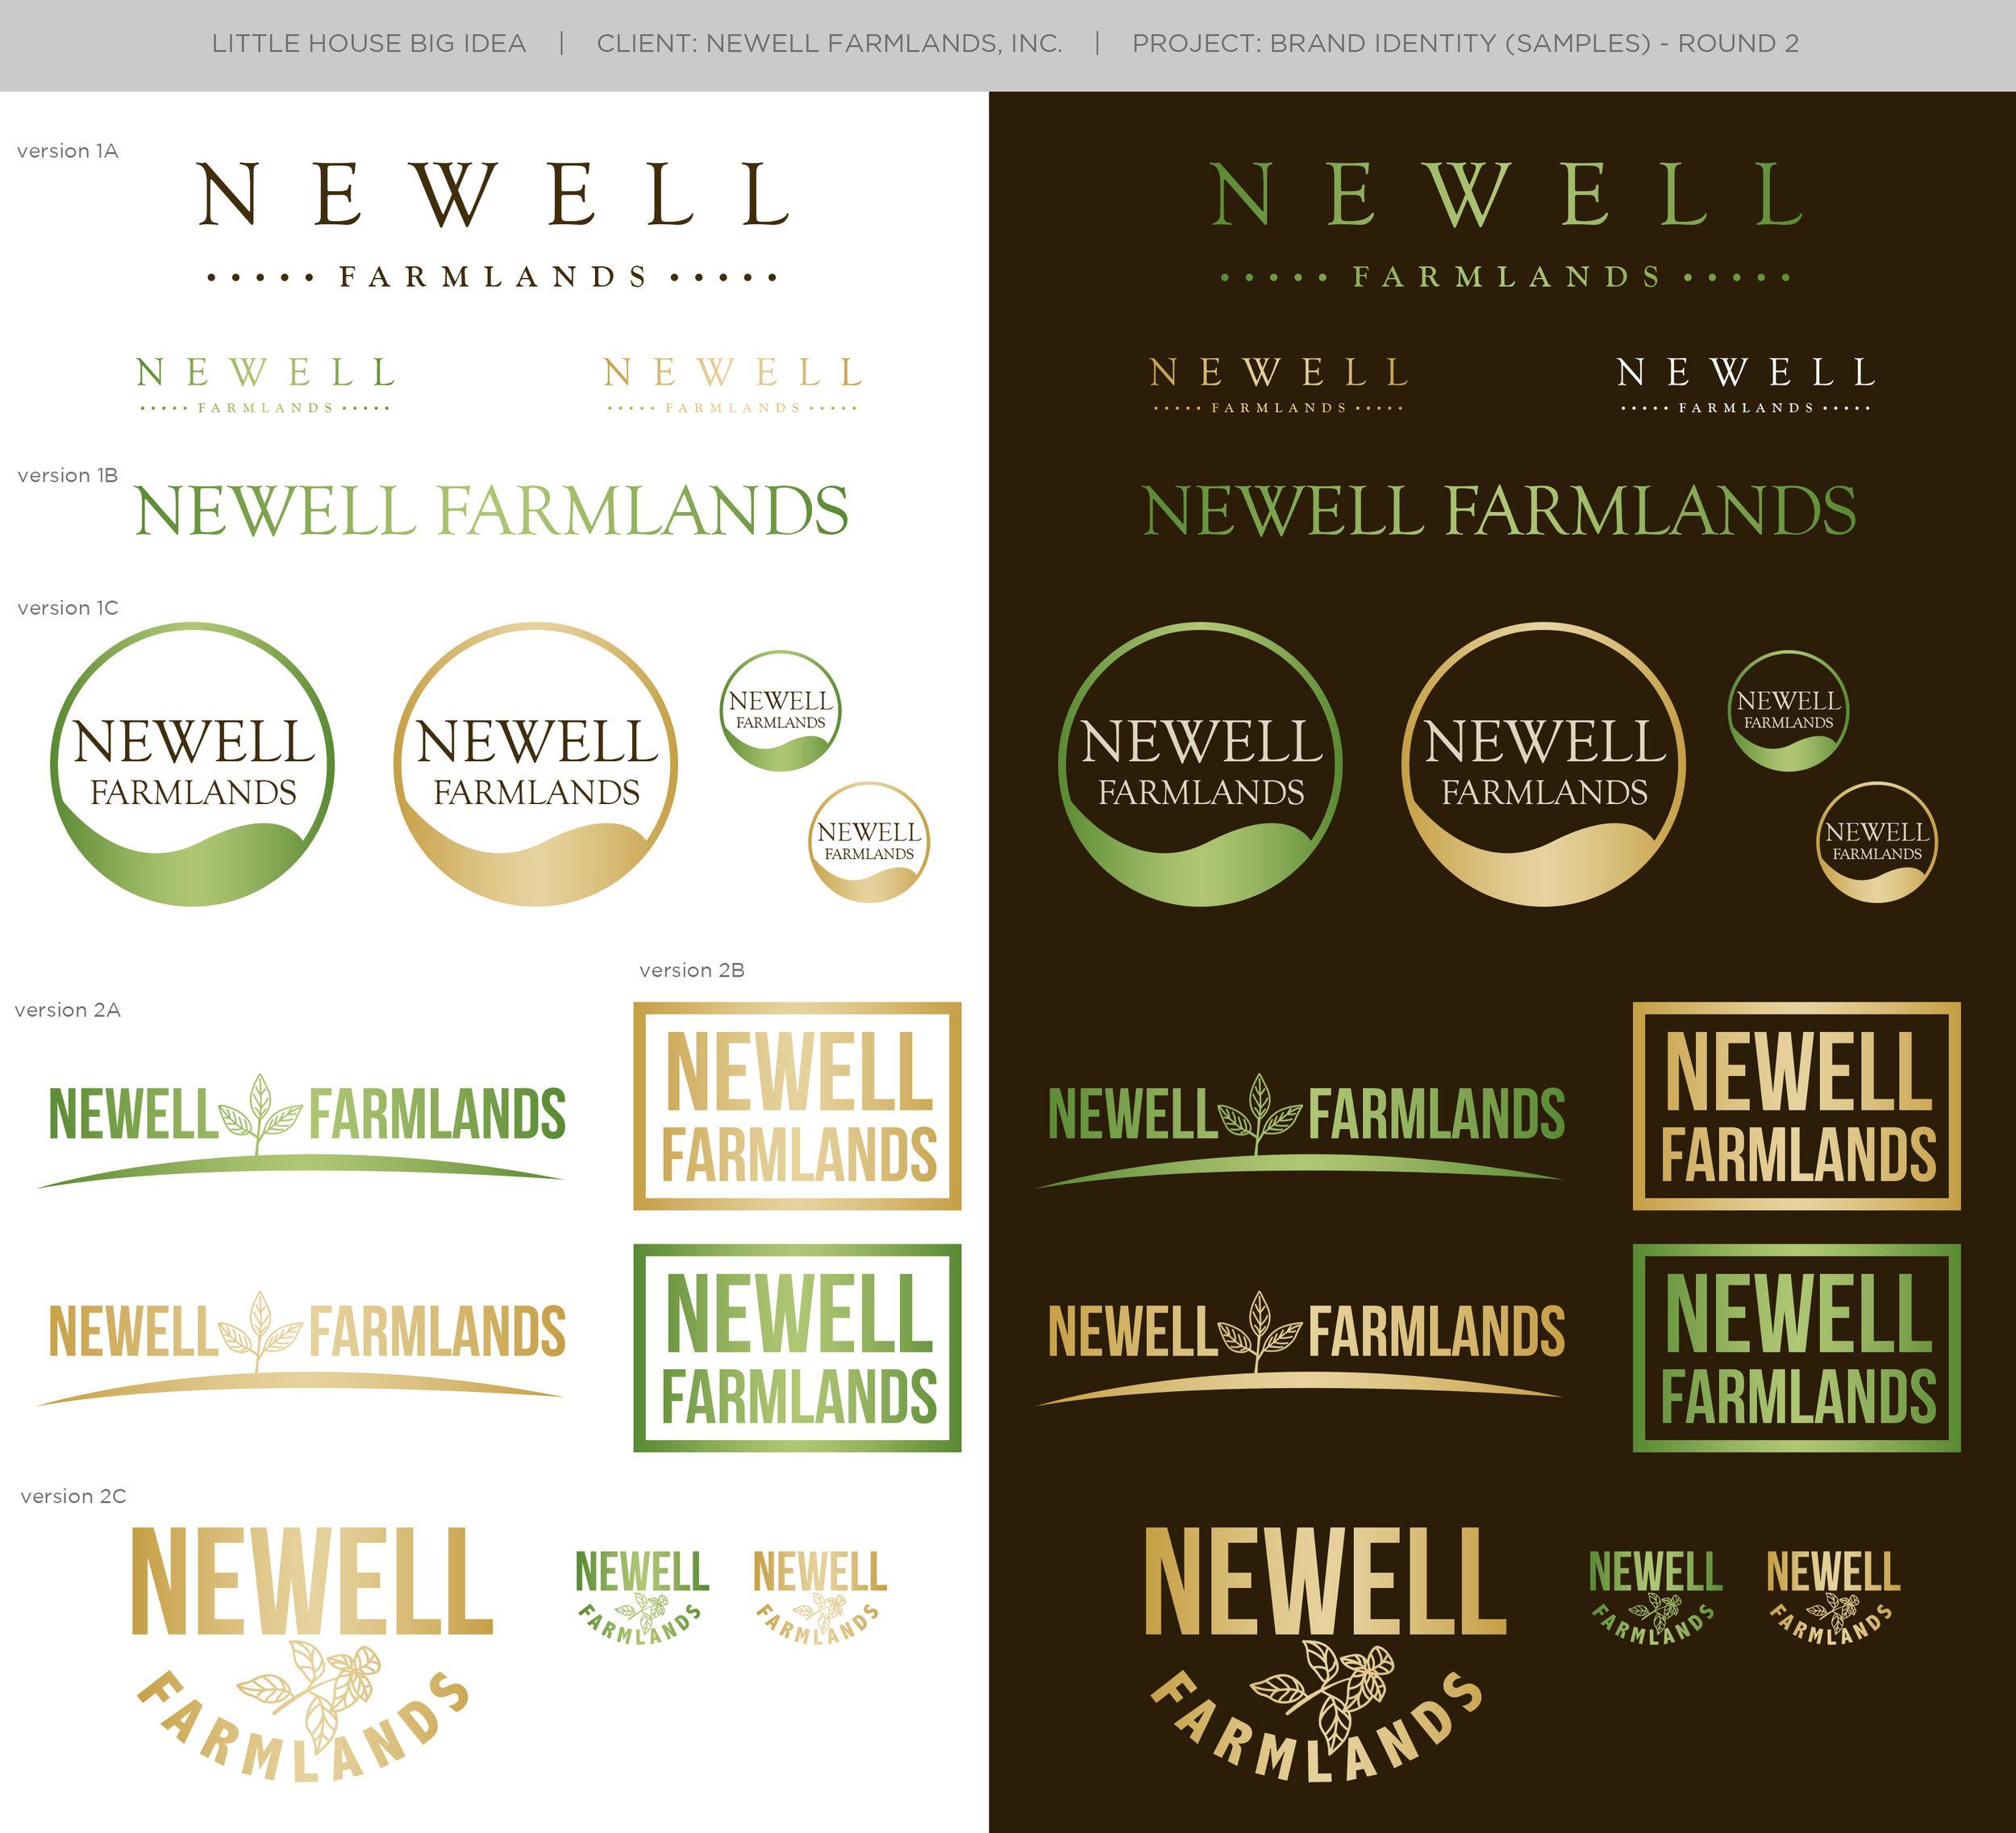 LHBI_NewellFarmlands_LogoSamples_Round2_01.30.17.jpg